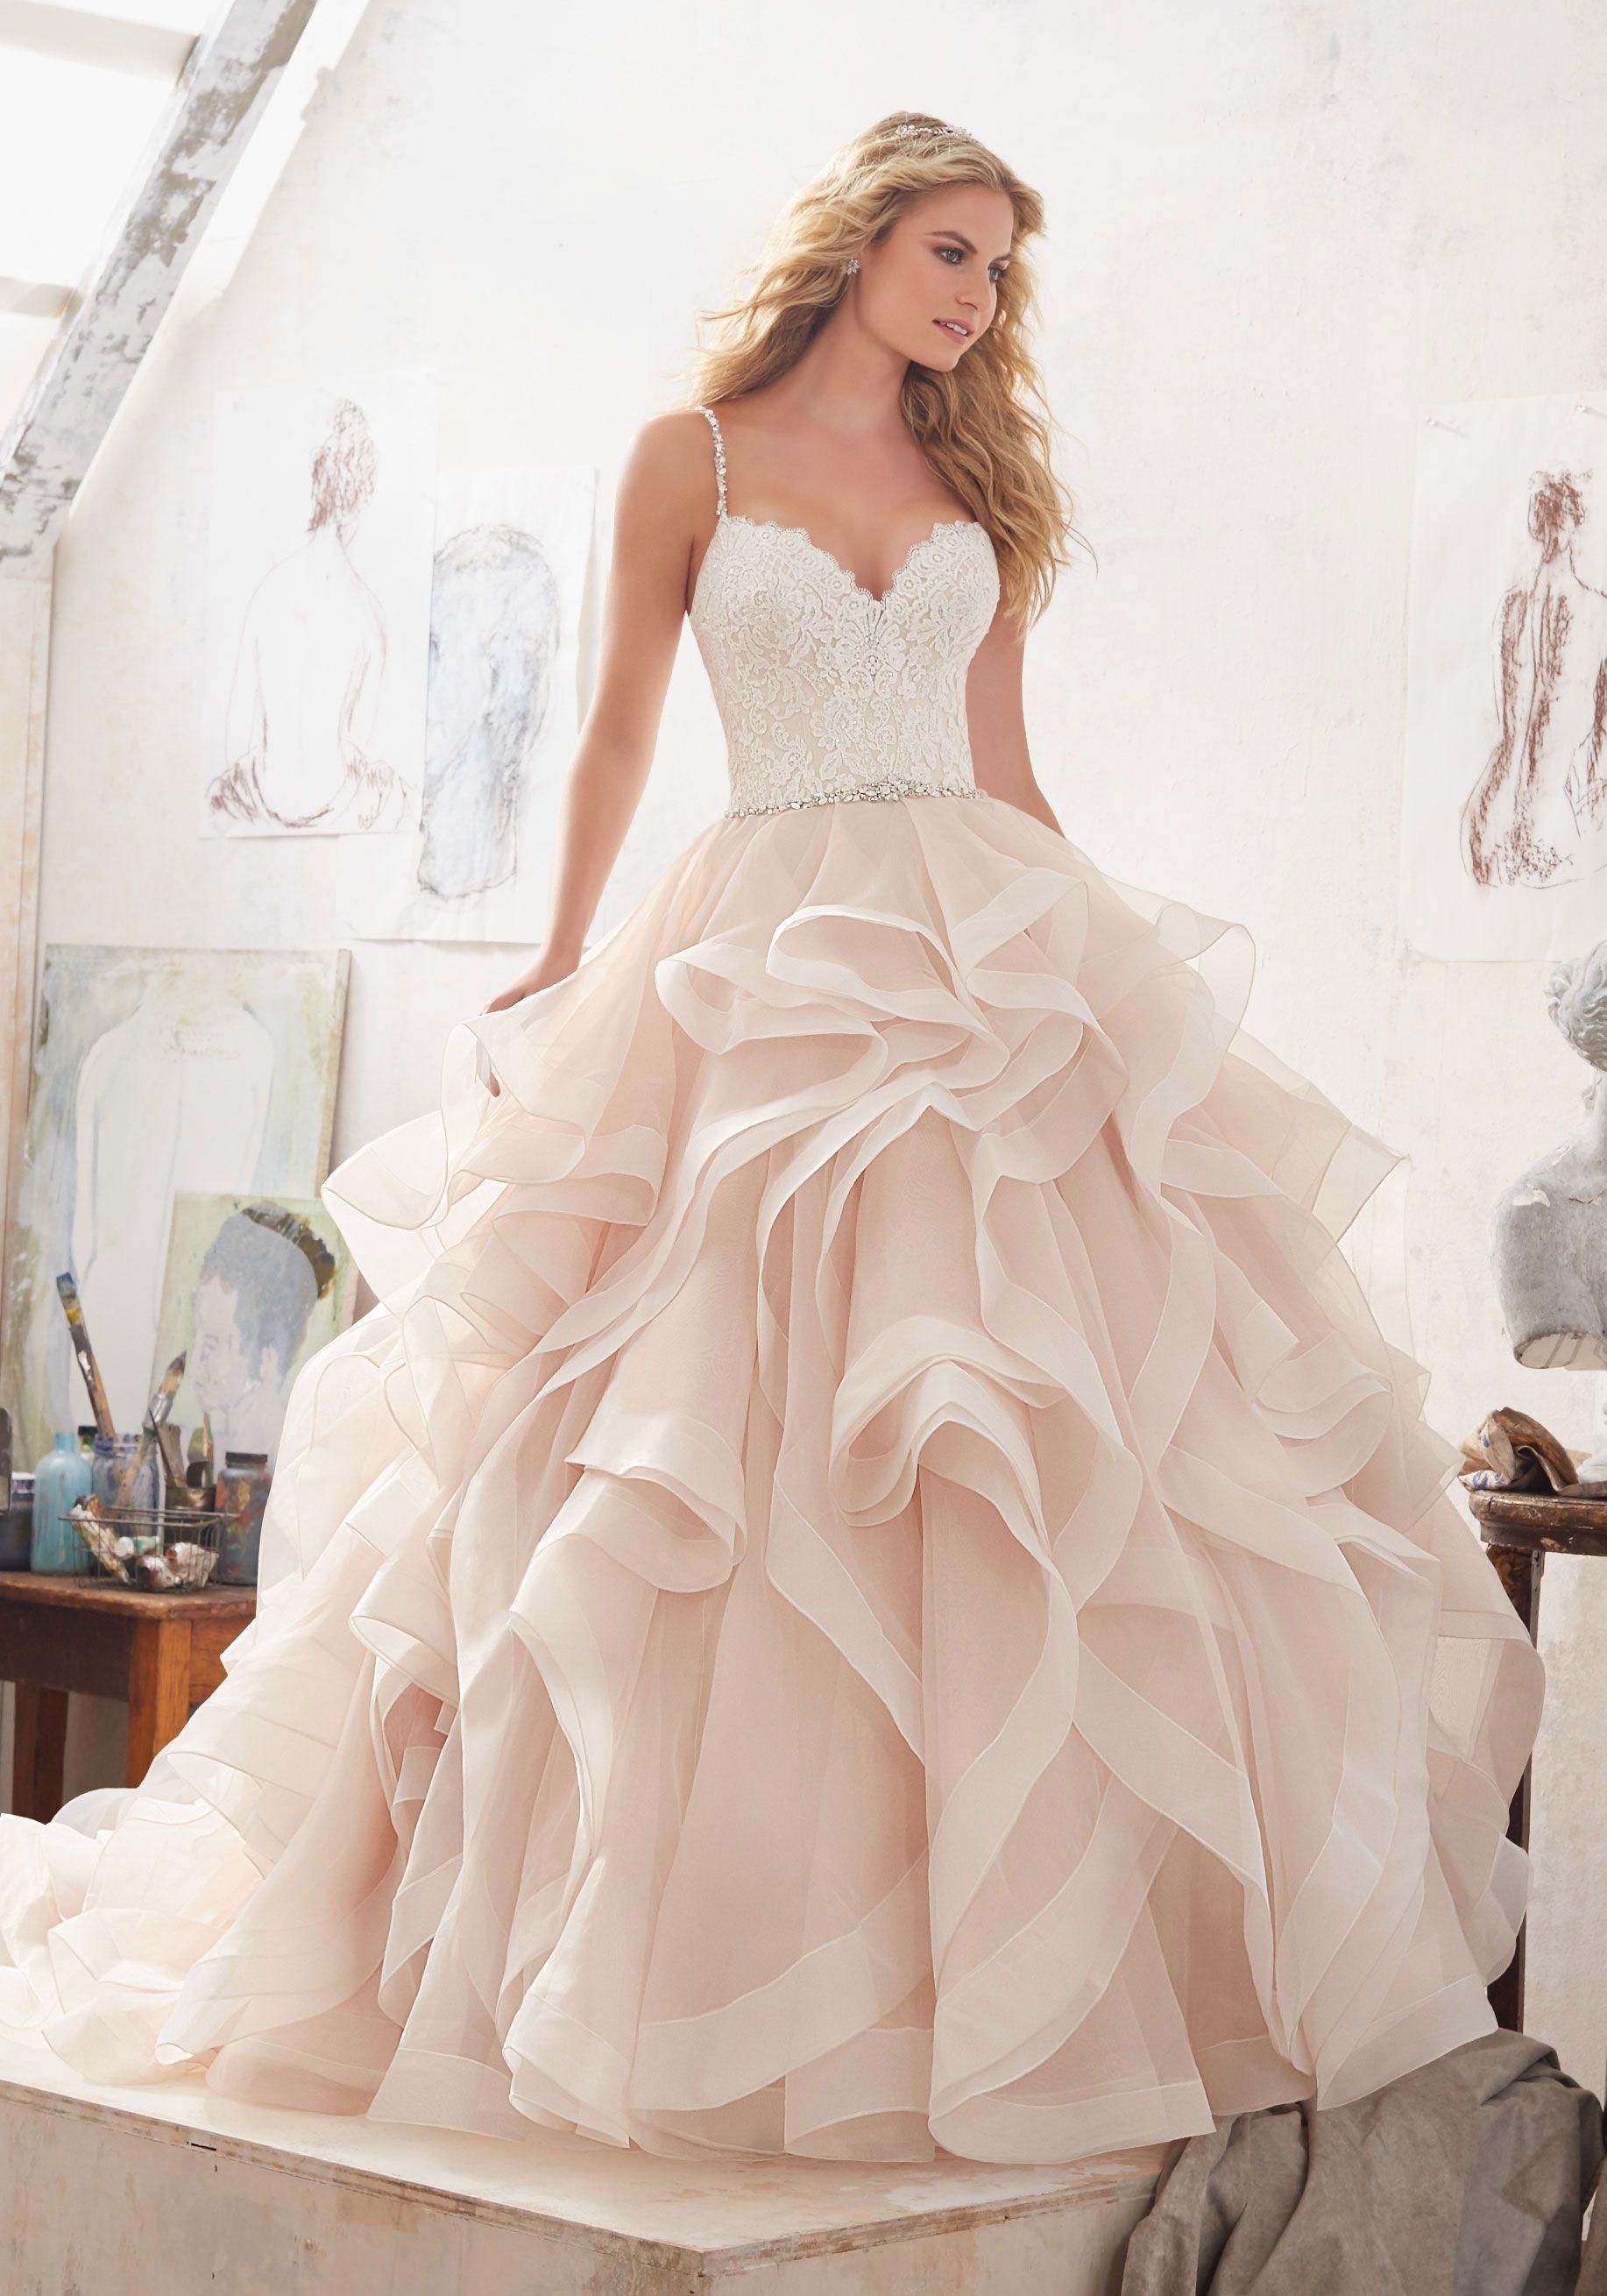 Marilyn Wedding Dress Morilee Wedding Dresses Blush Peach Blush Wedding Dress Wedding Dresses